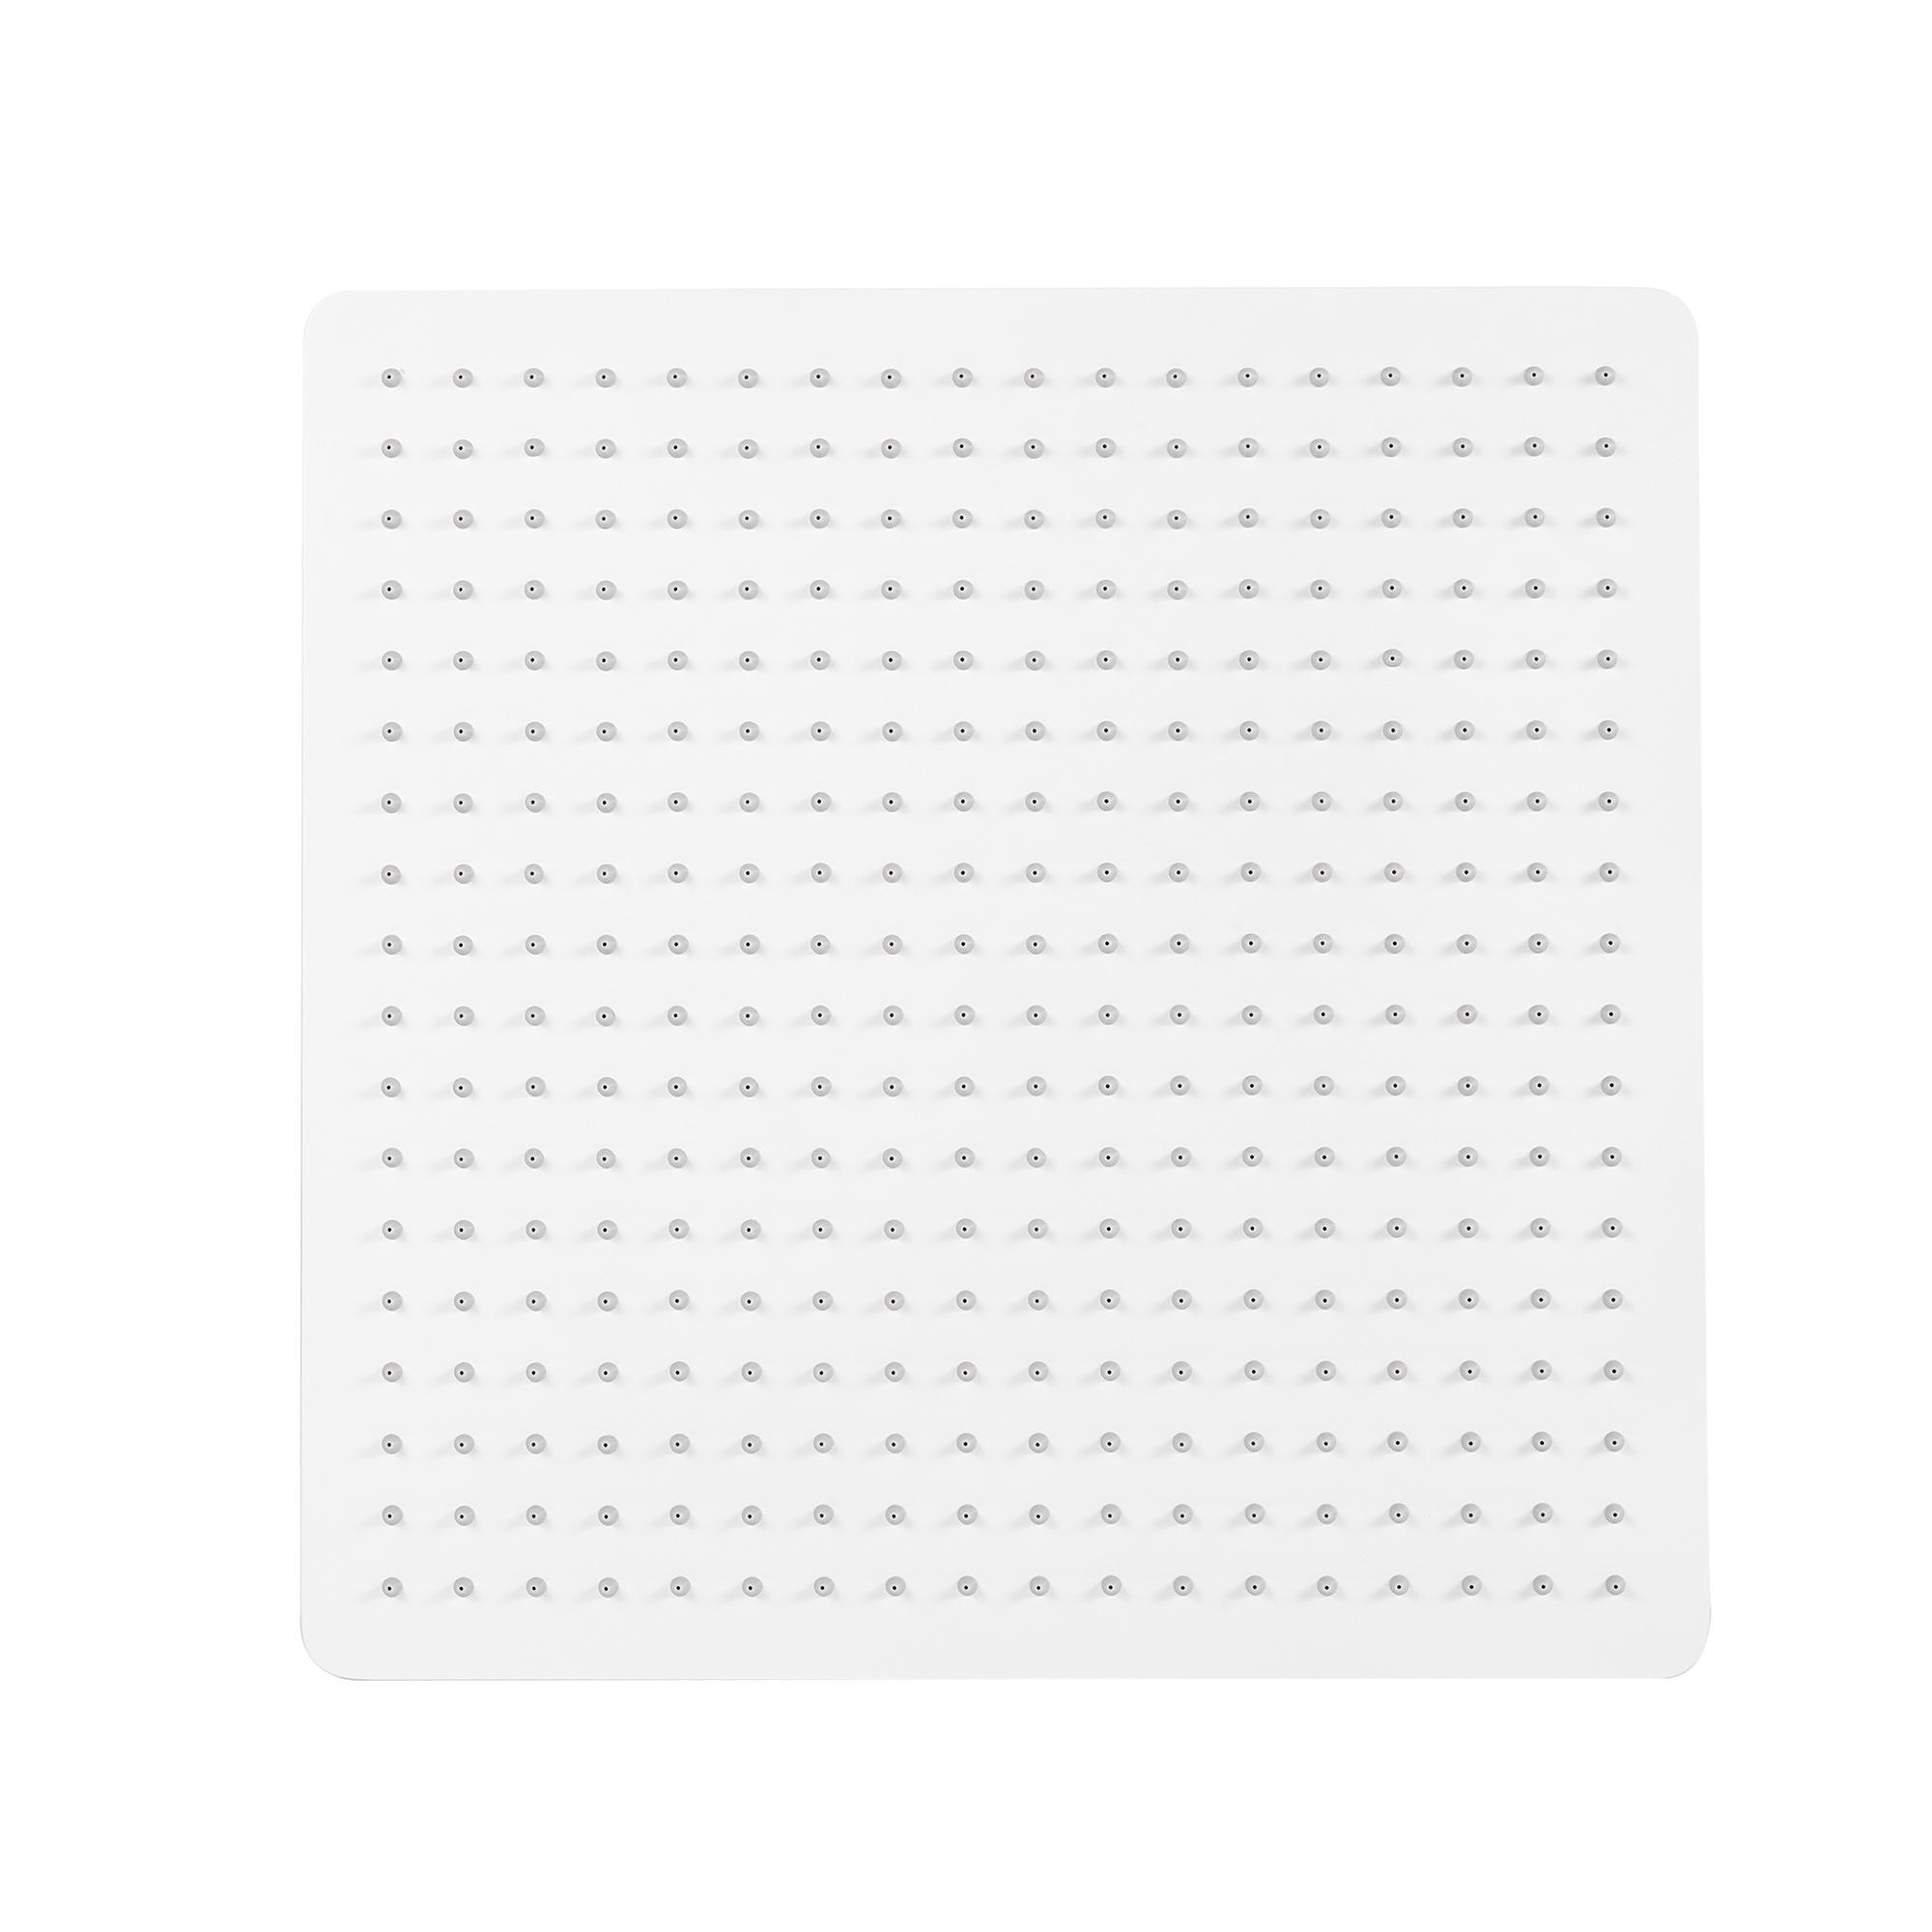 XXL-Regendusche Edelstahl-Duschkopf DPG2001 superflach in Weiß Matt - 40 x 40 cm